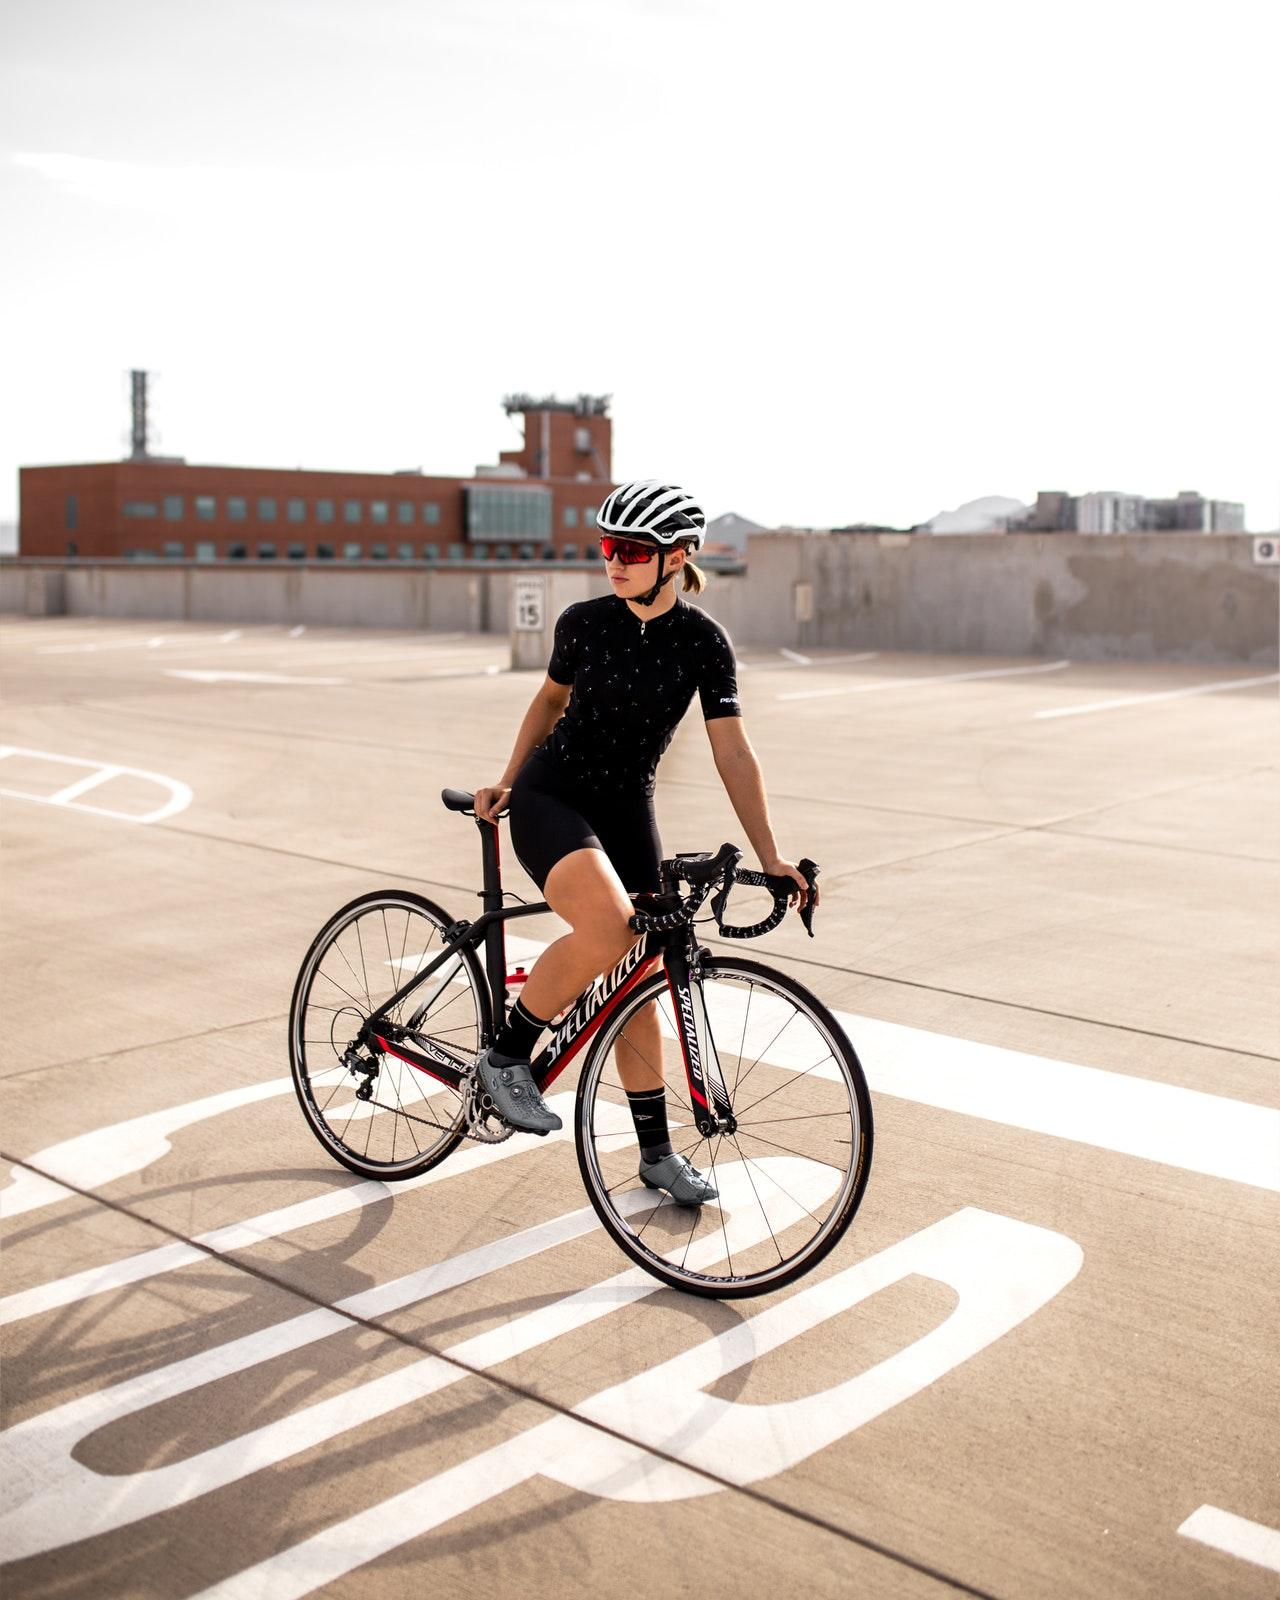 Bliv sikrere på cyklen med cykelhjelm og cykellås